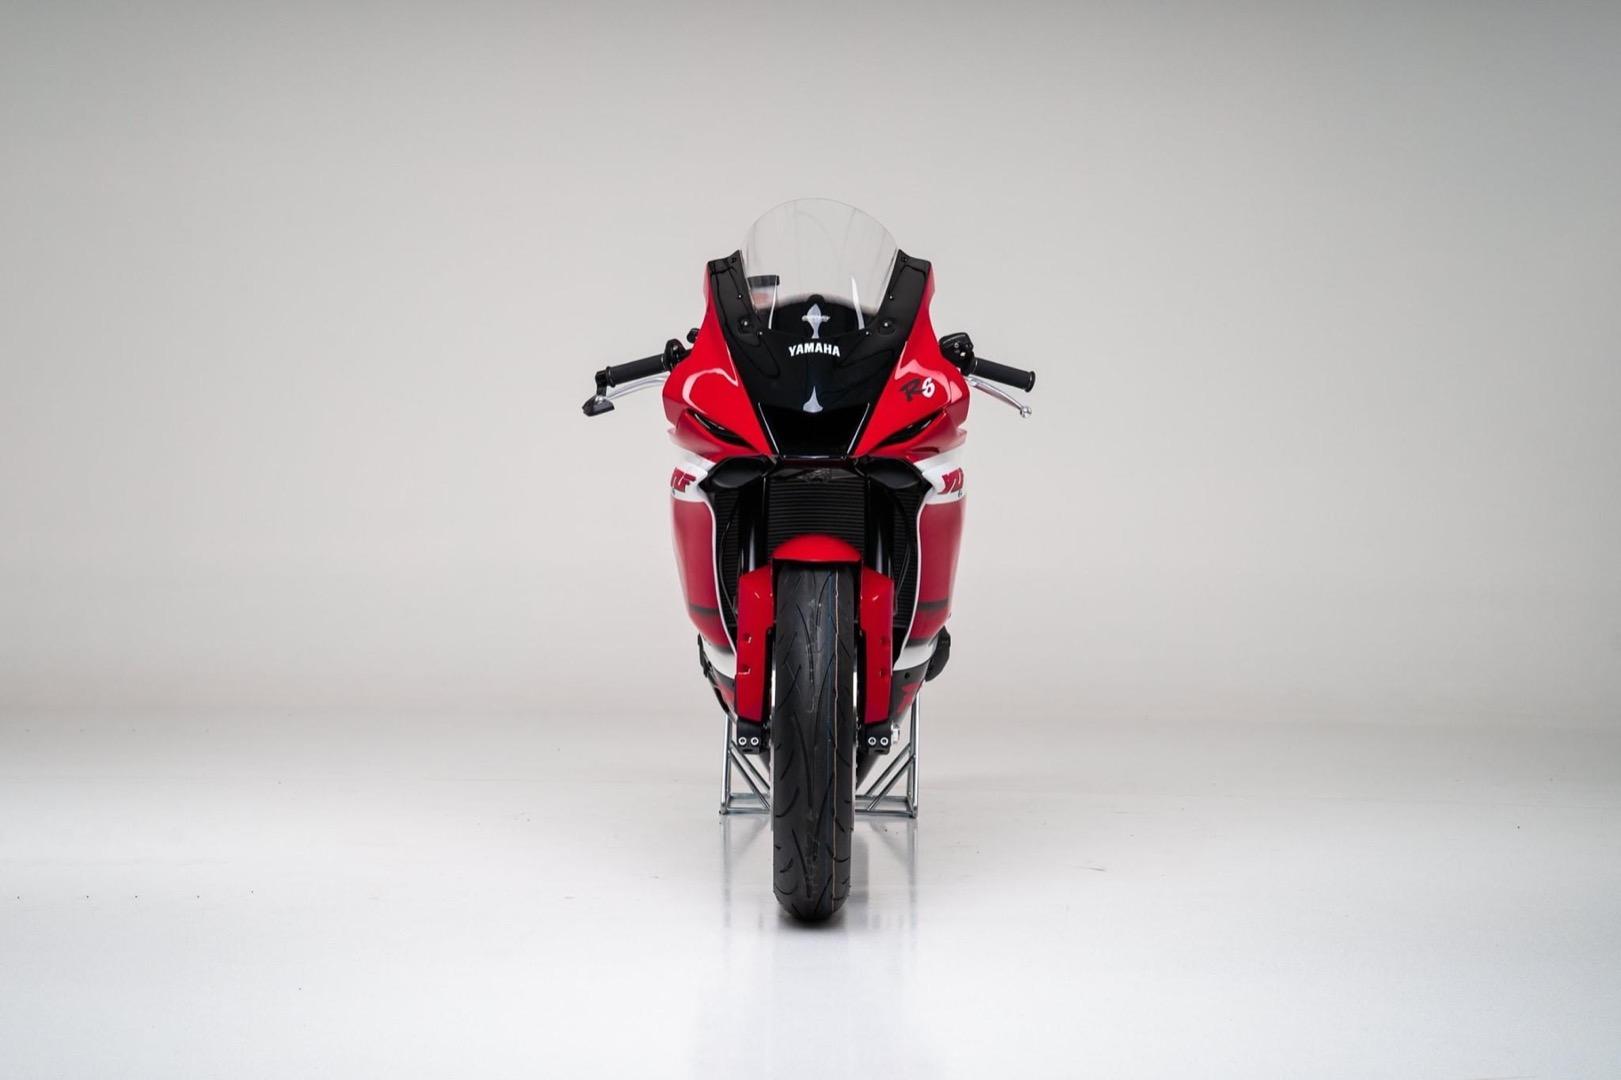 Yamaha YZF-R6 2020 20 Aniversario, por Yamaha Austria Racing Team